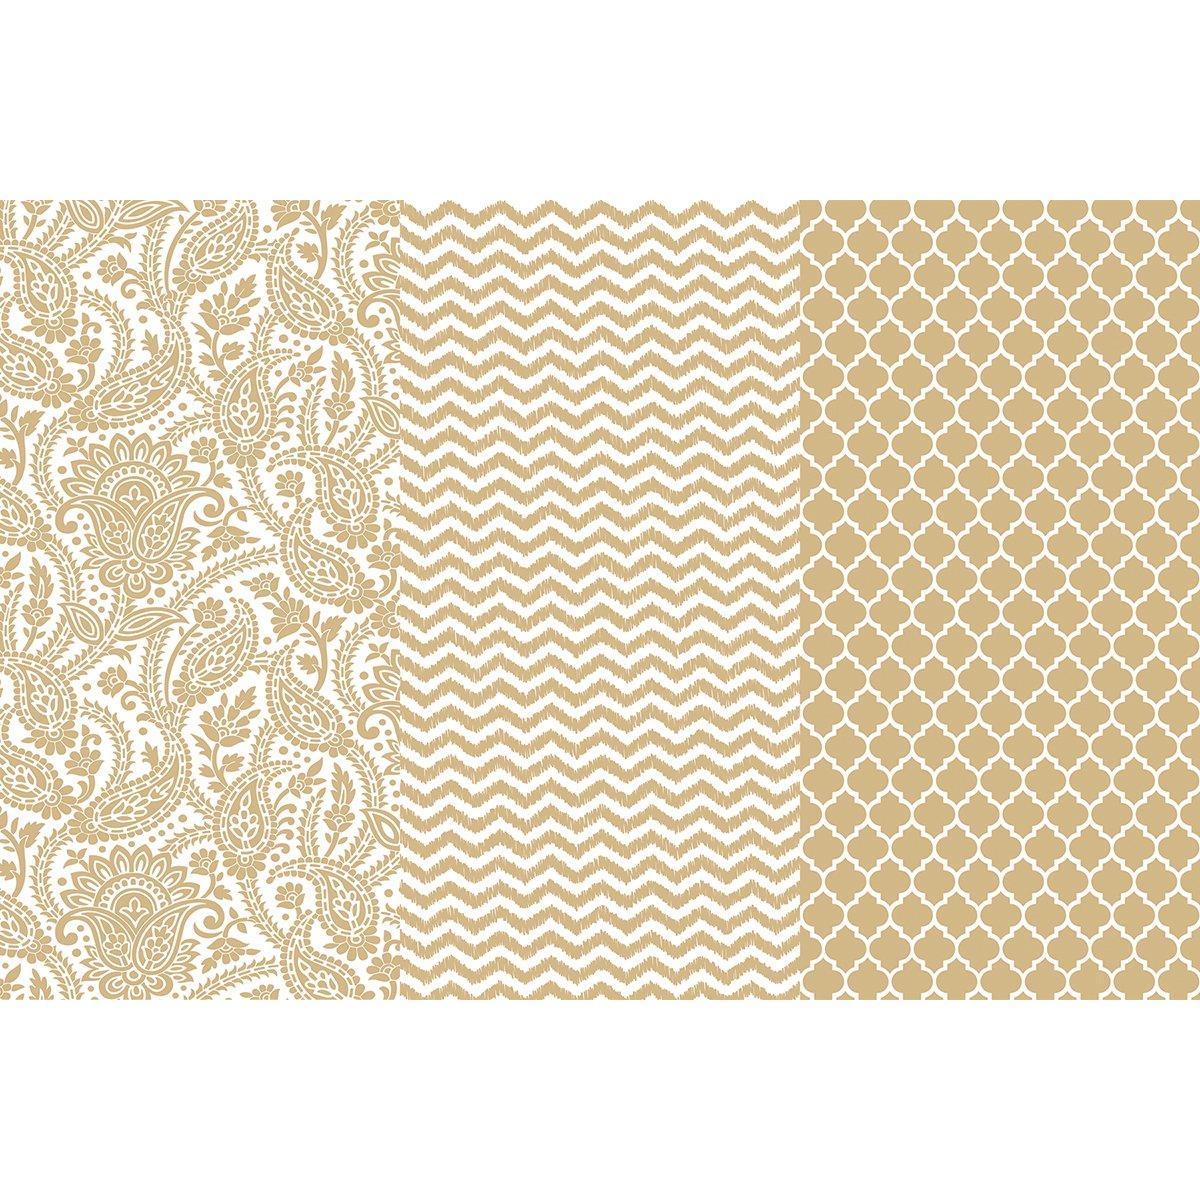 DecoArt Decoupage Paper (3 Pack), 12'' by 16'', Gold Trends